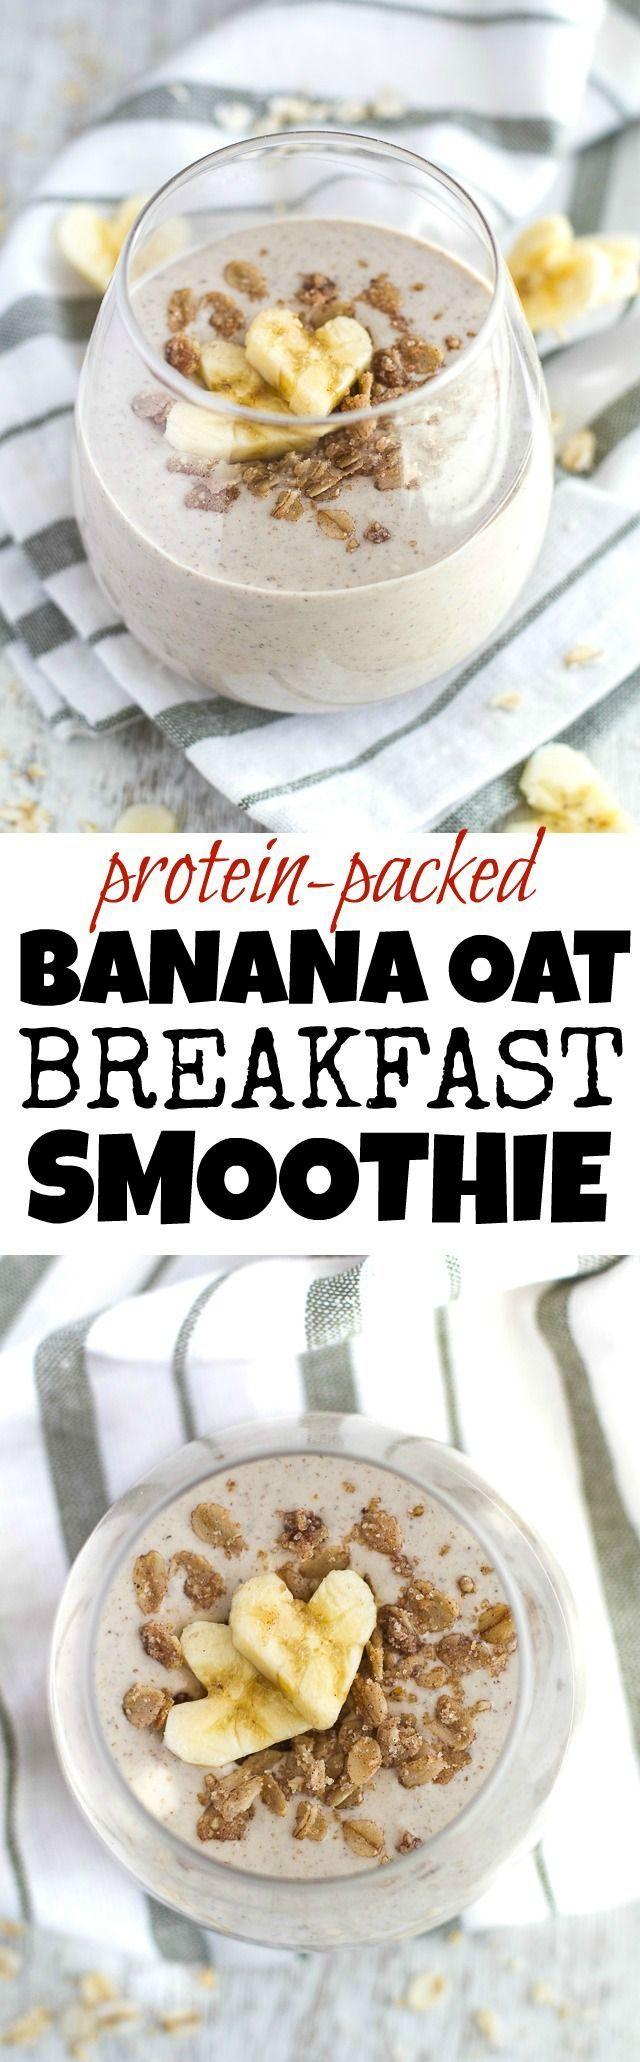 banana oat breakfast smoothie recipe smoothie bowls. Black Bedroom Furniture Sets. Home Design Ideas